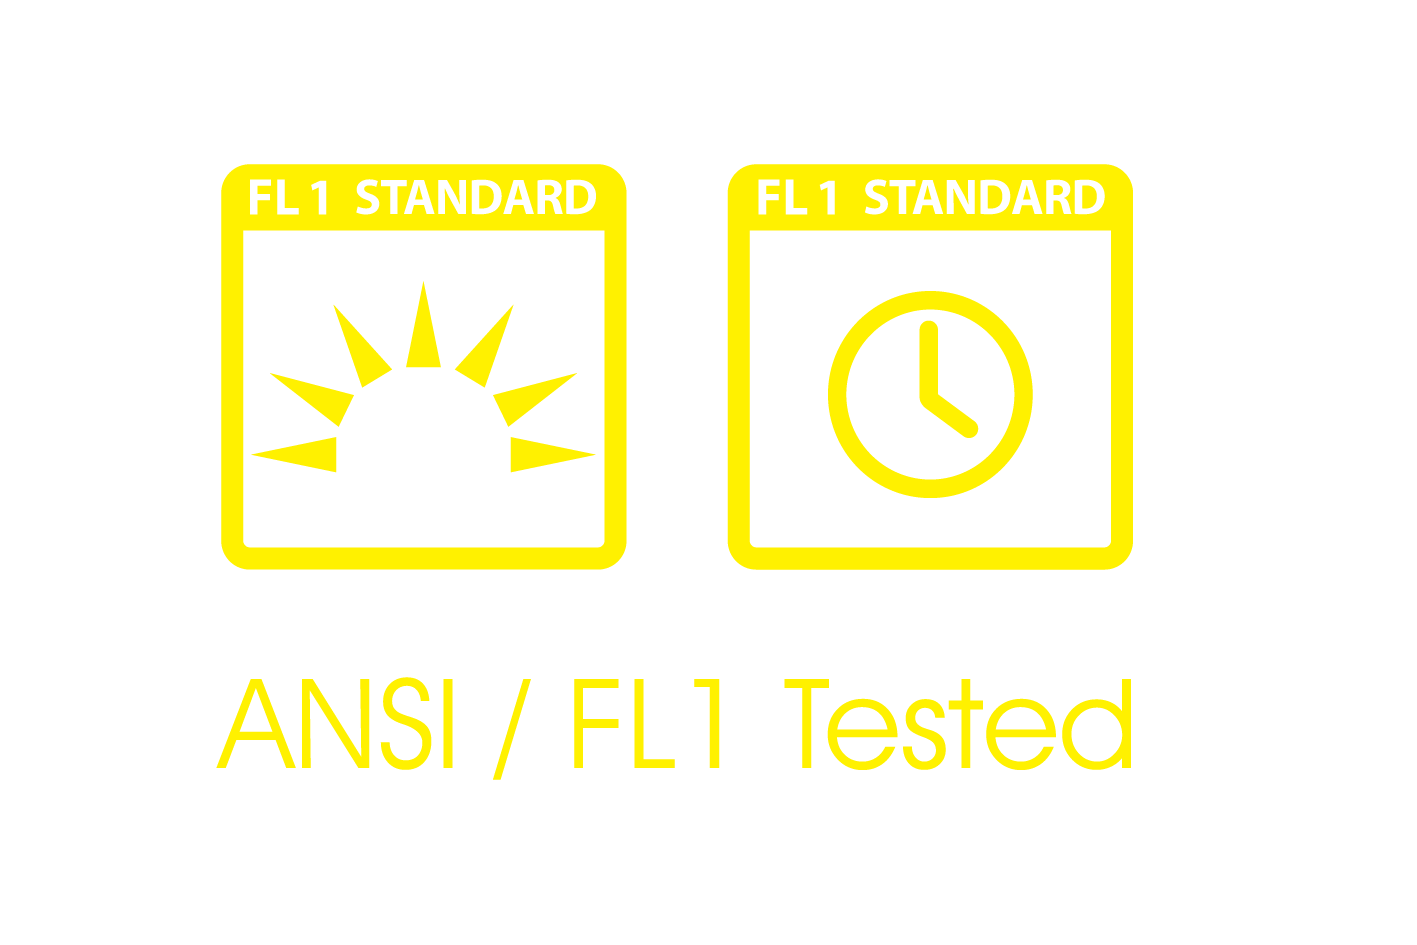 ANSI FL-1 TESTED